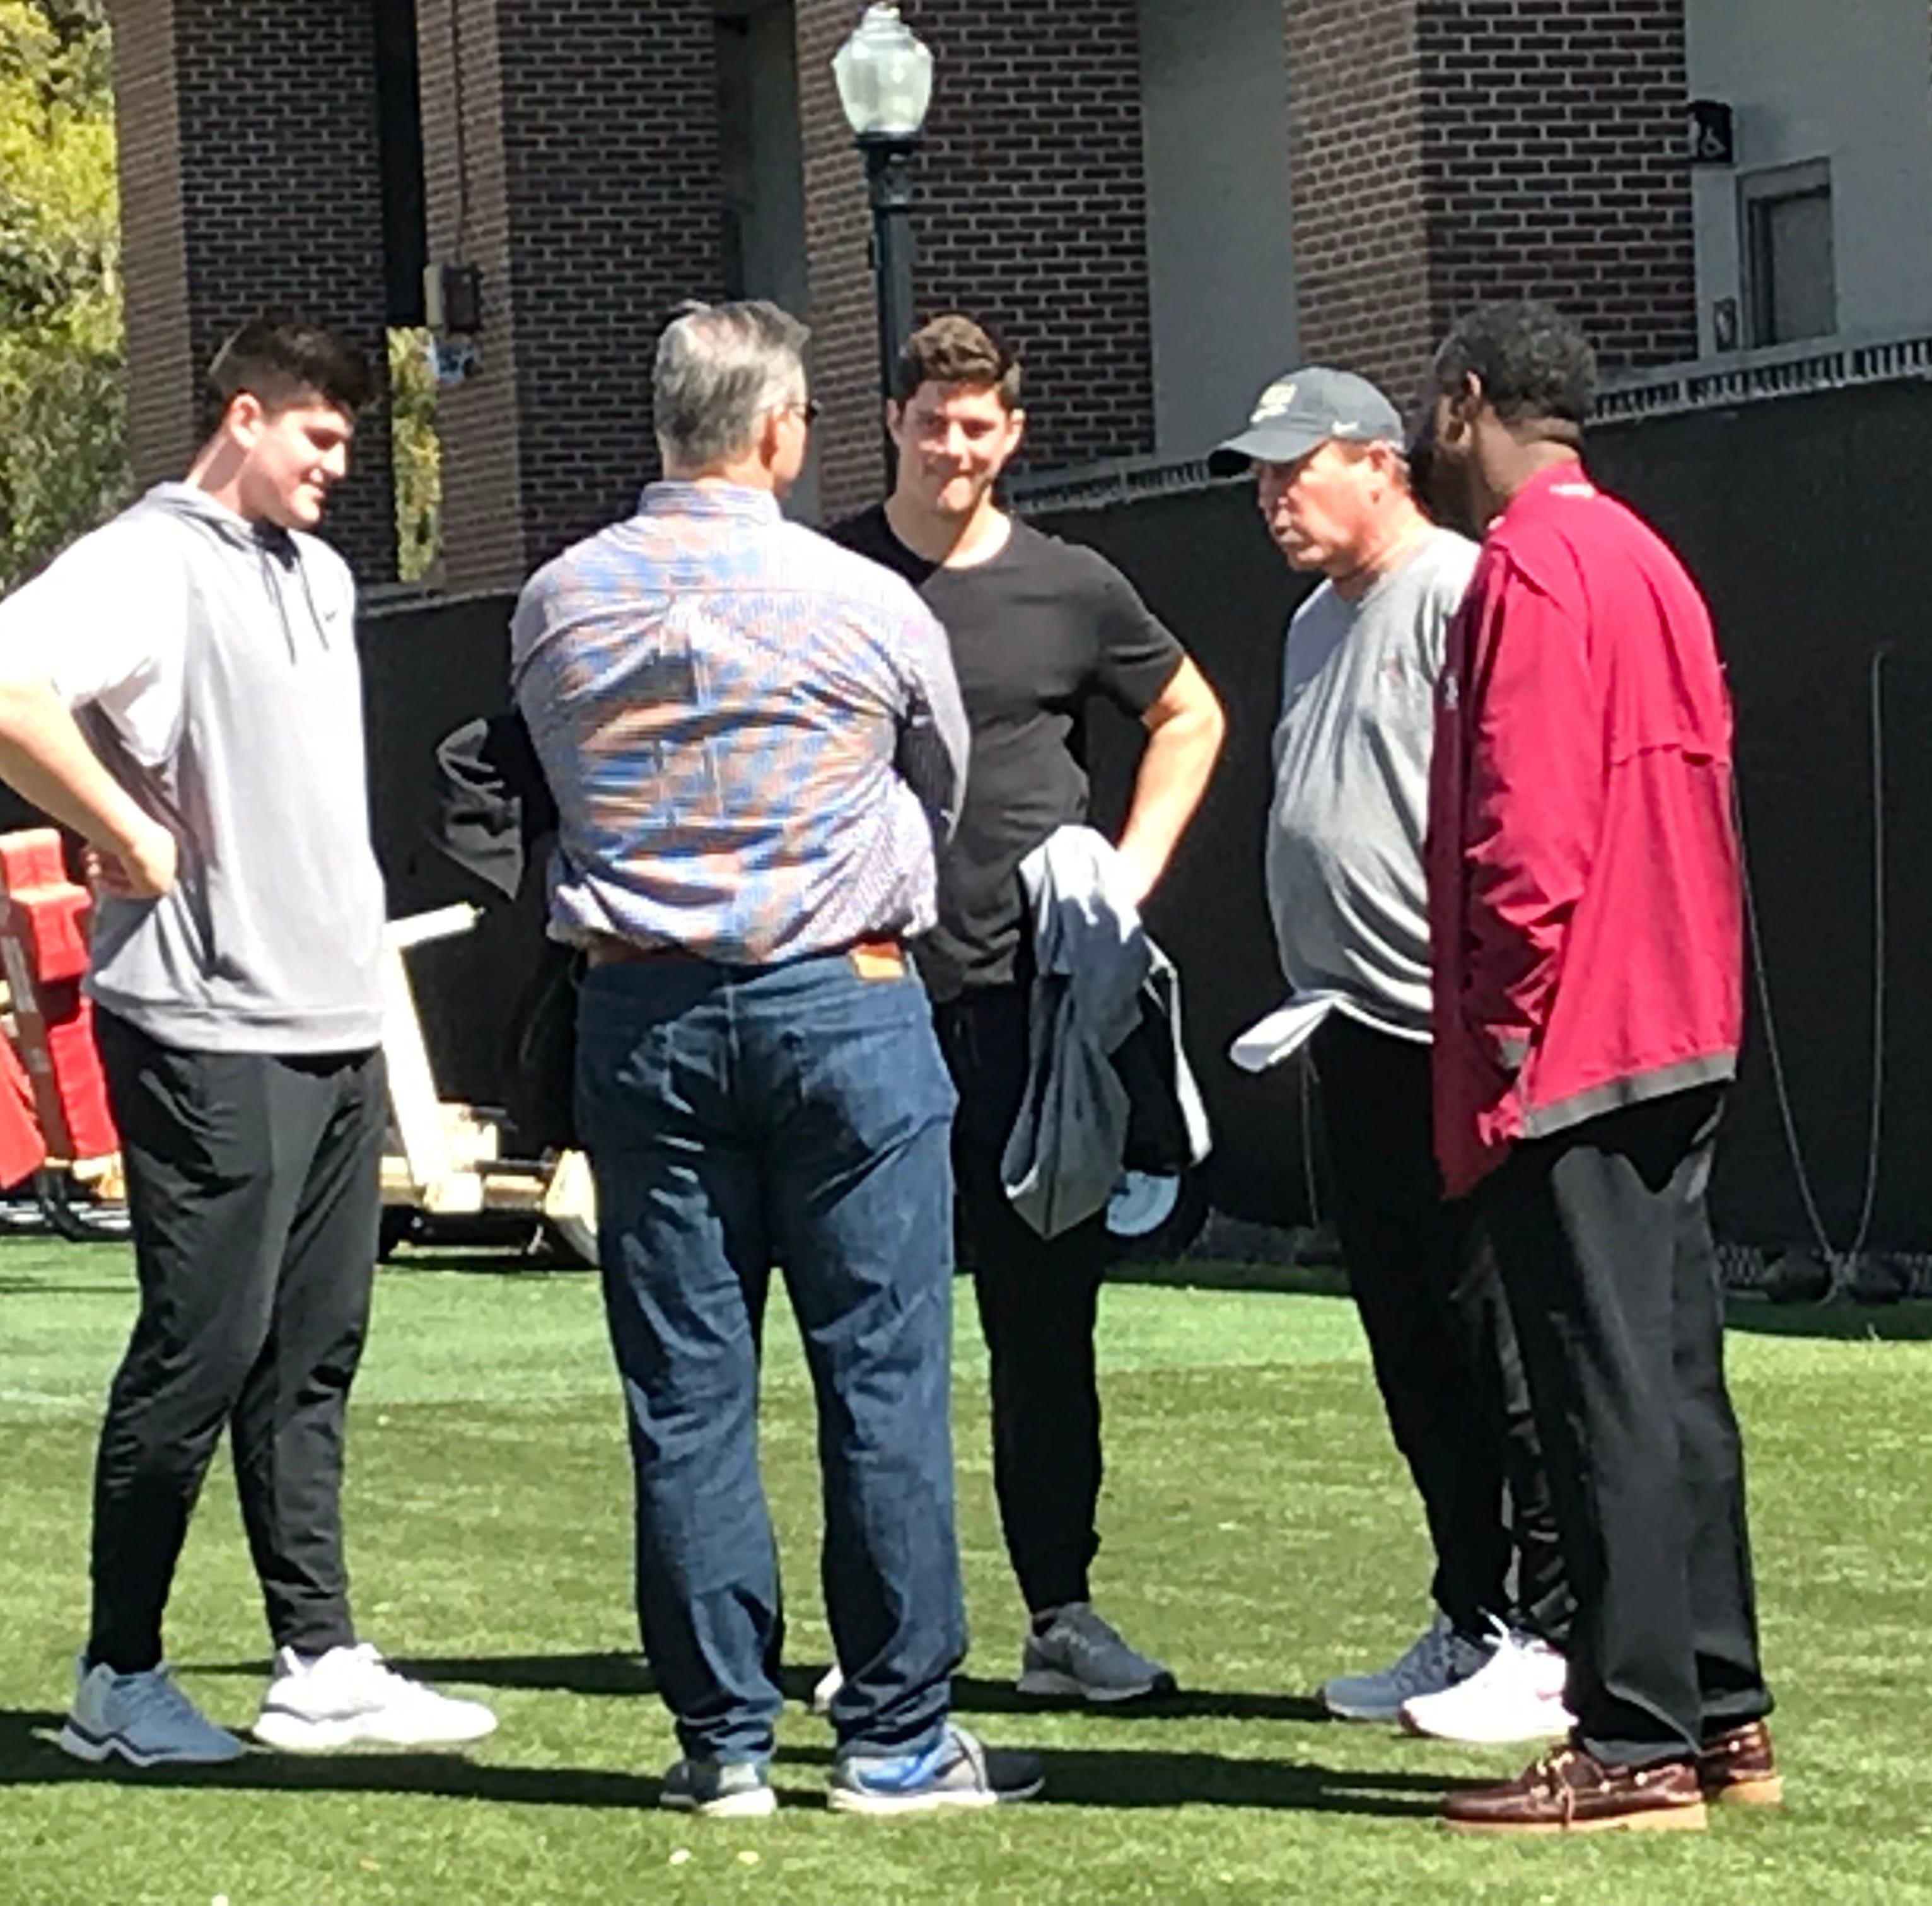 Wisconsin grad transfer quarterback Alex Hornibrook visiting Florida State